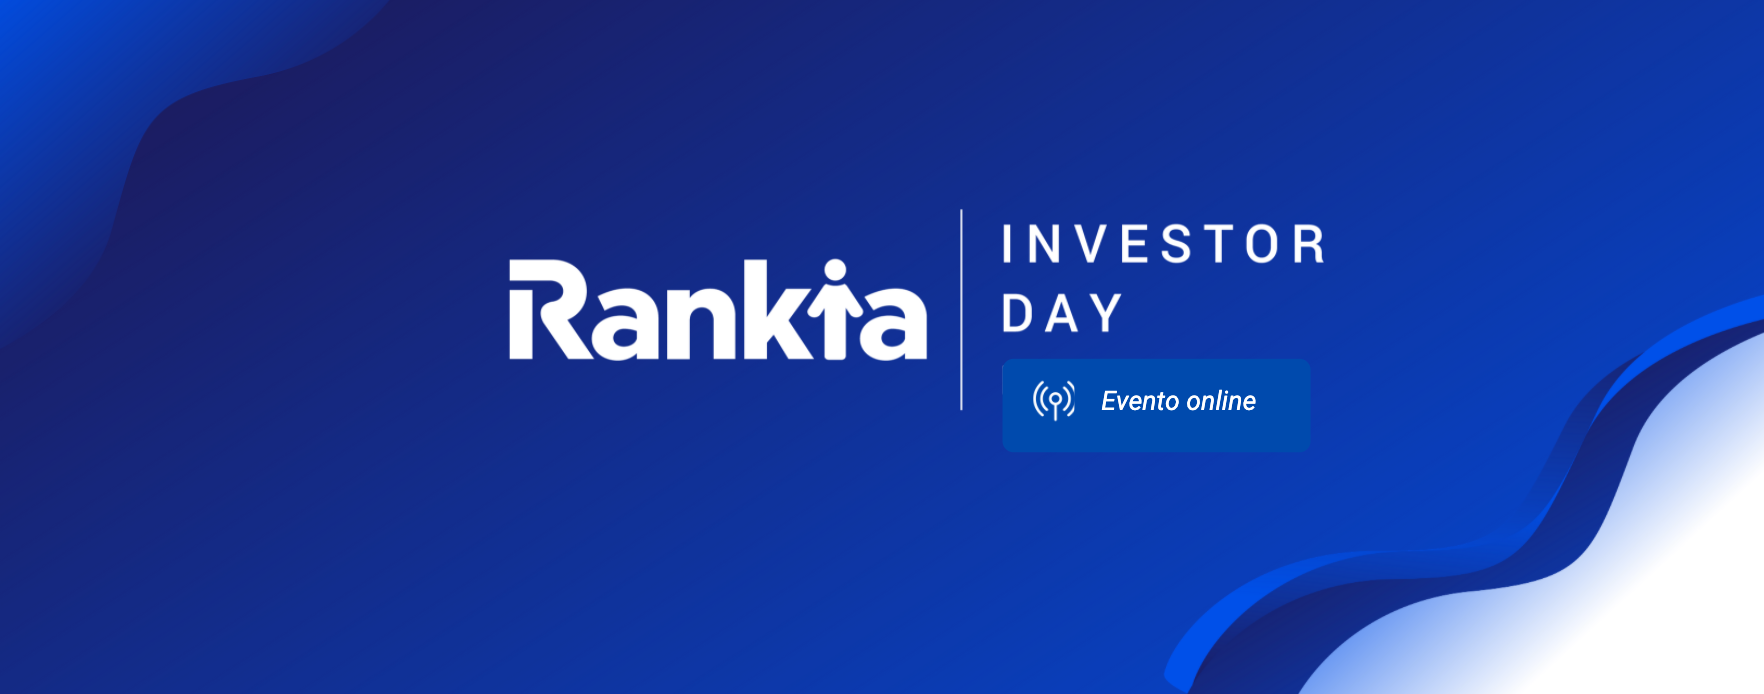 Rankia Investor Day online